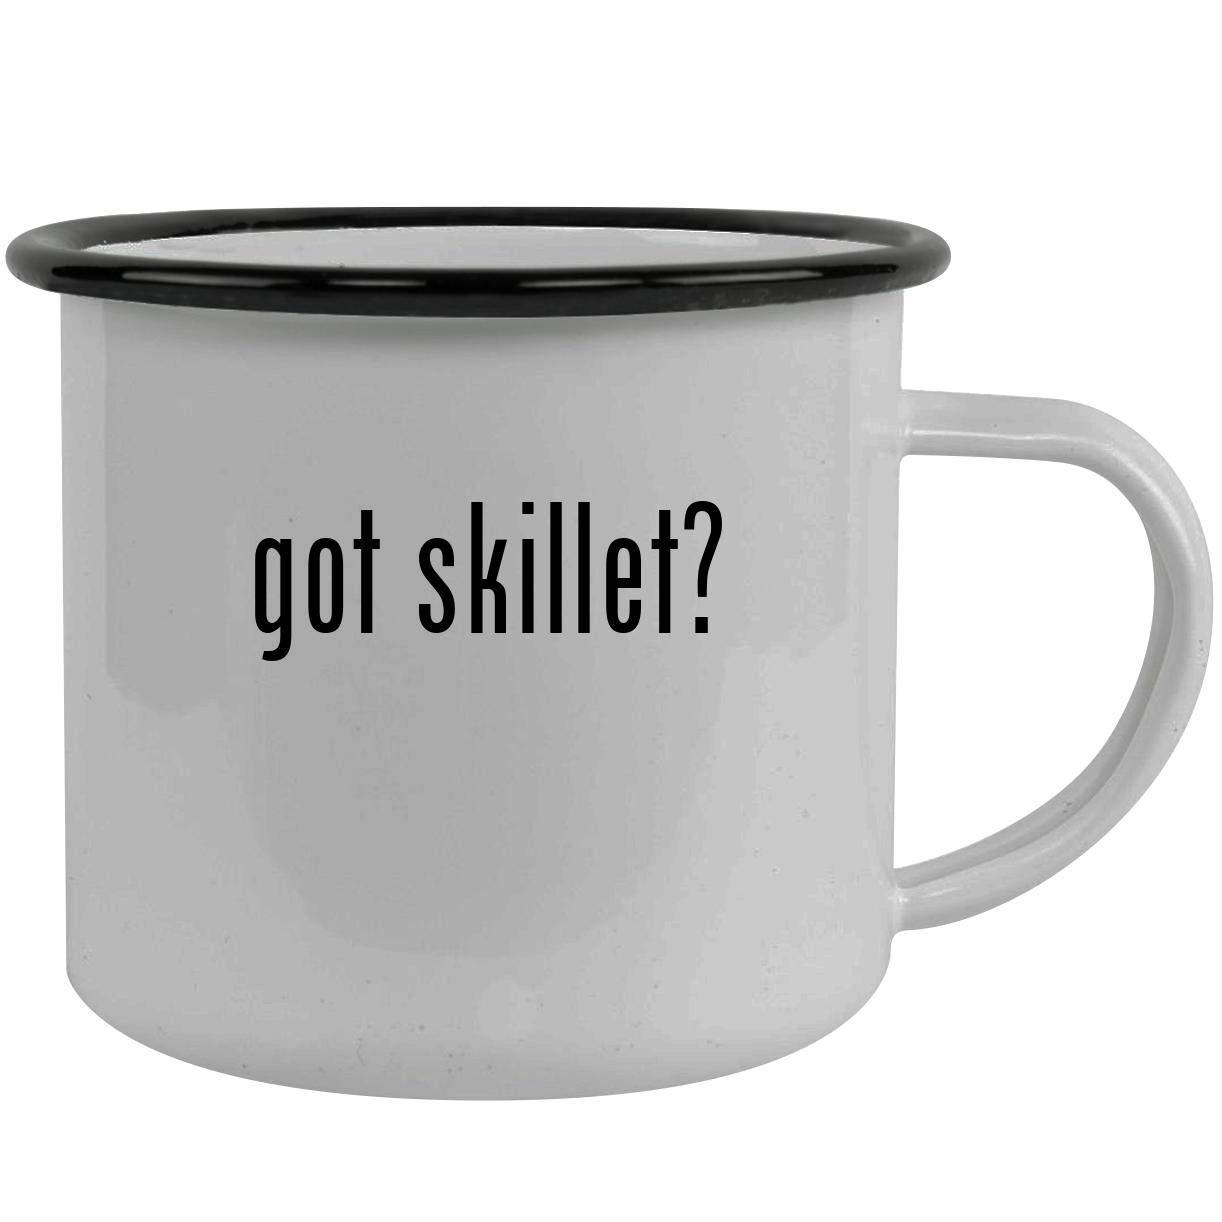 got skillet? - Stainless Steel 12oz Camping Mug, Black